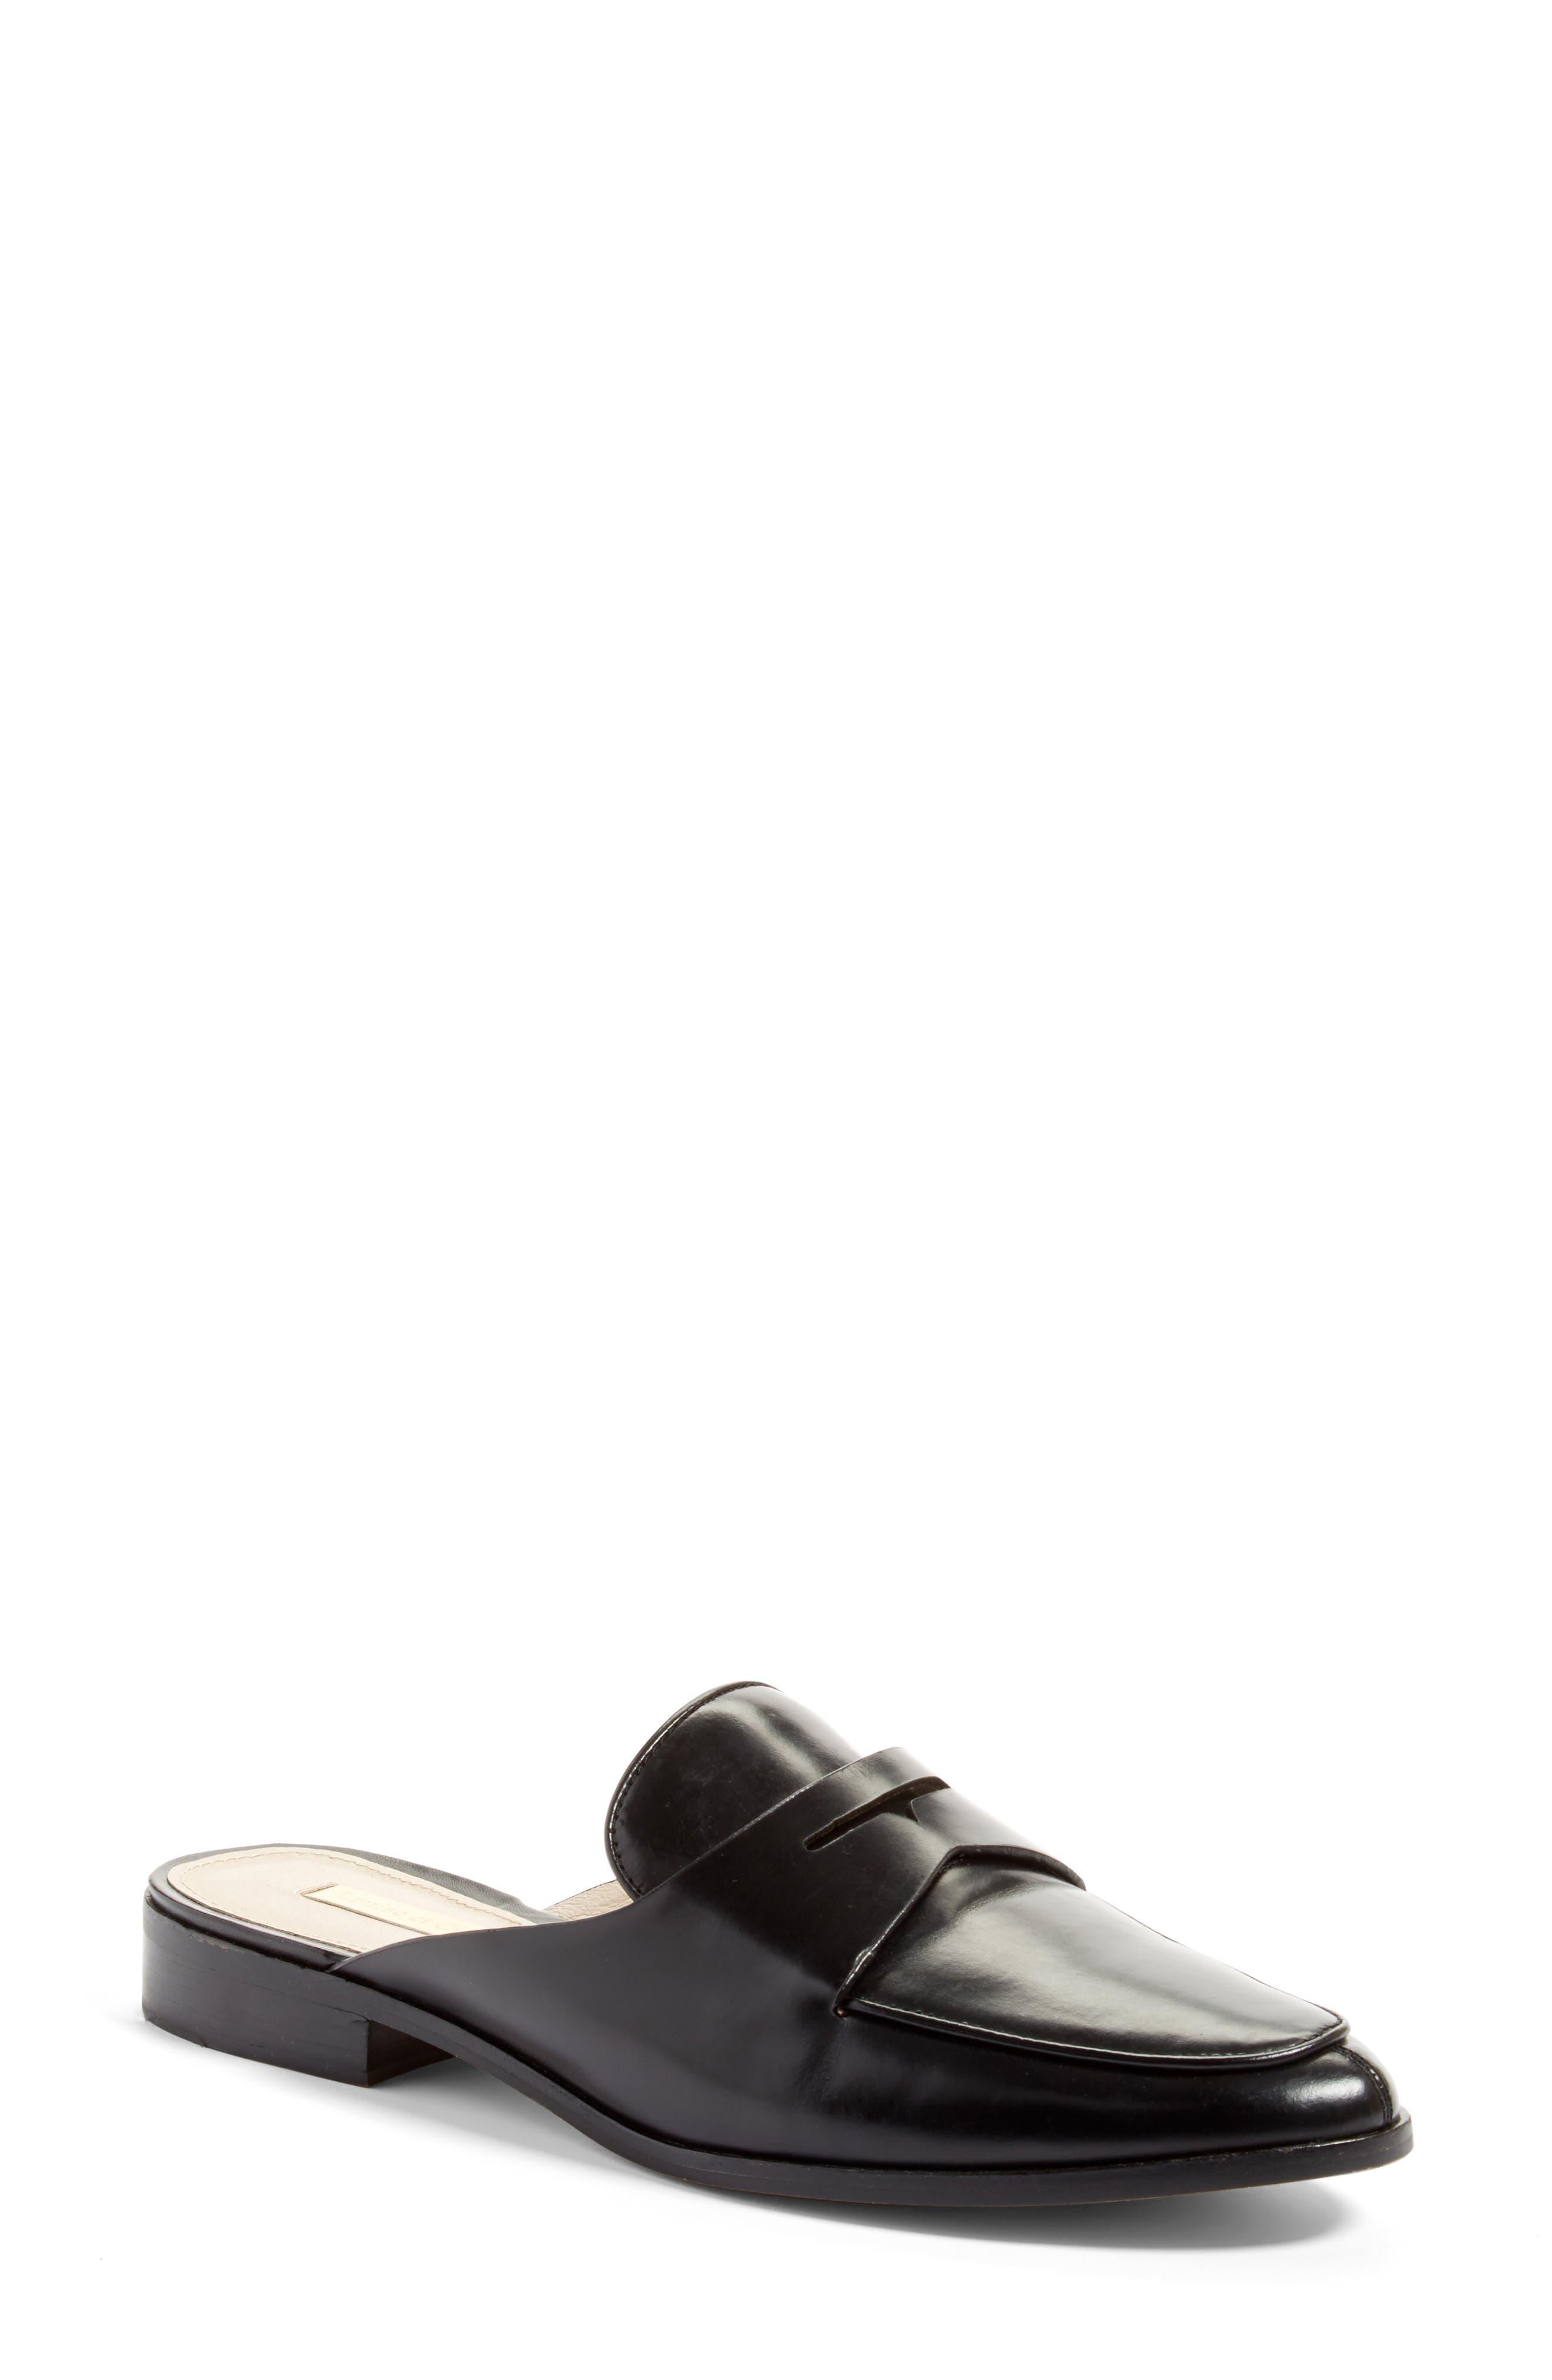 Dugan Flat Loafer Mule,                             Main thumbnail 1, color,                             Black Leather